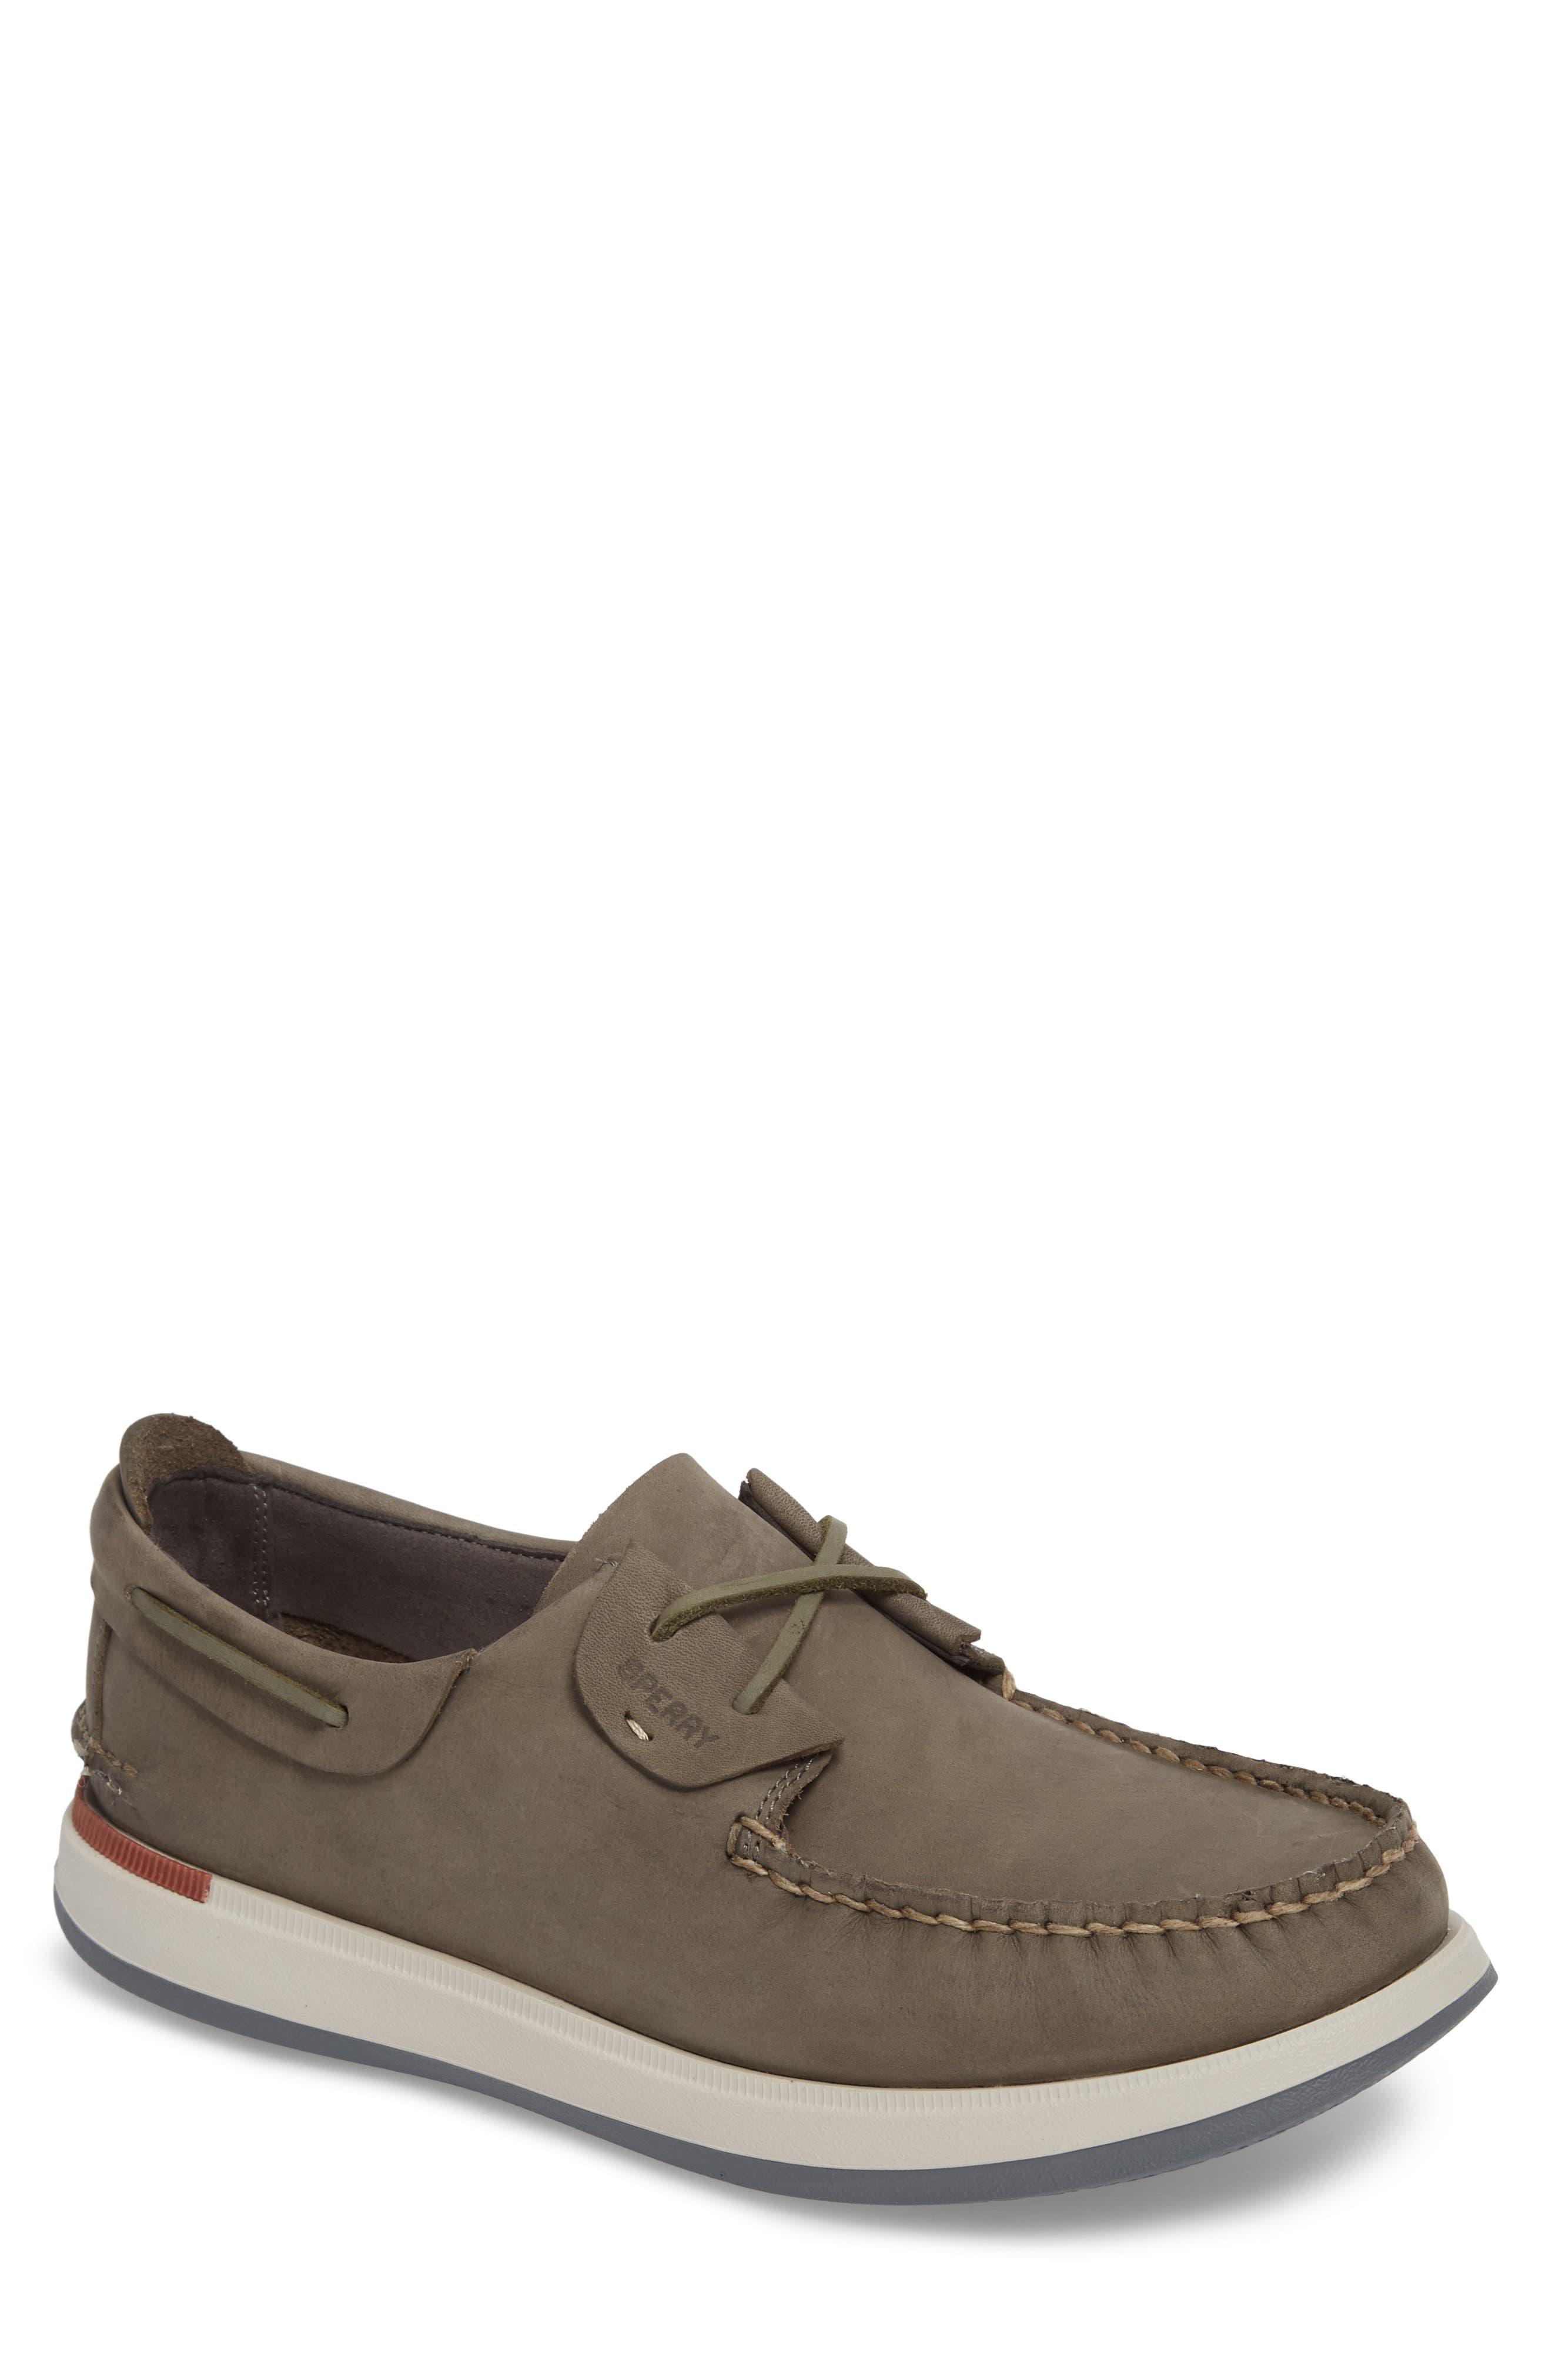 Caspian Boat Shoe,                             Main thumbnail 1, color,                             Grey Leather